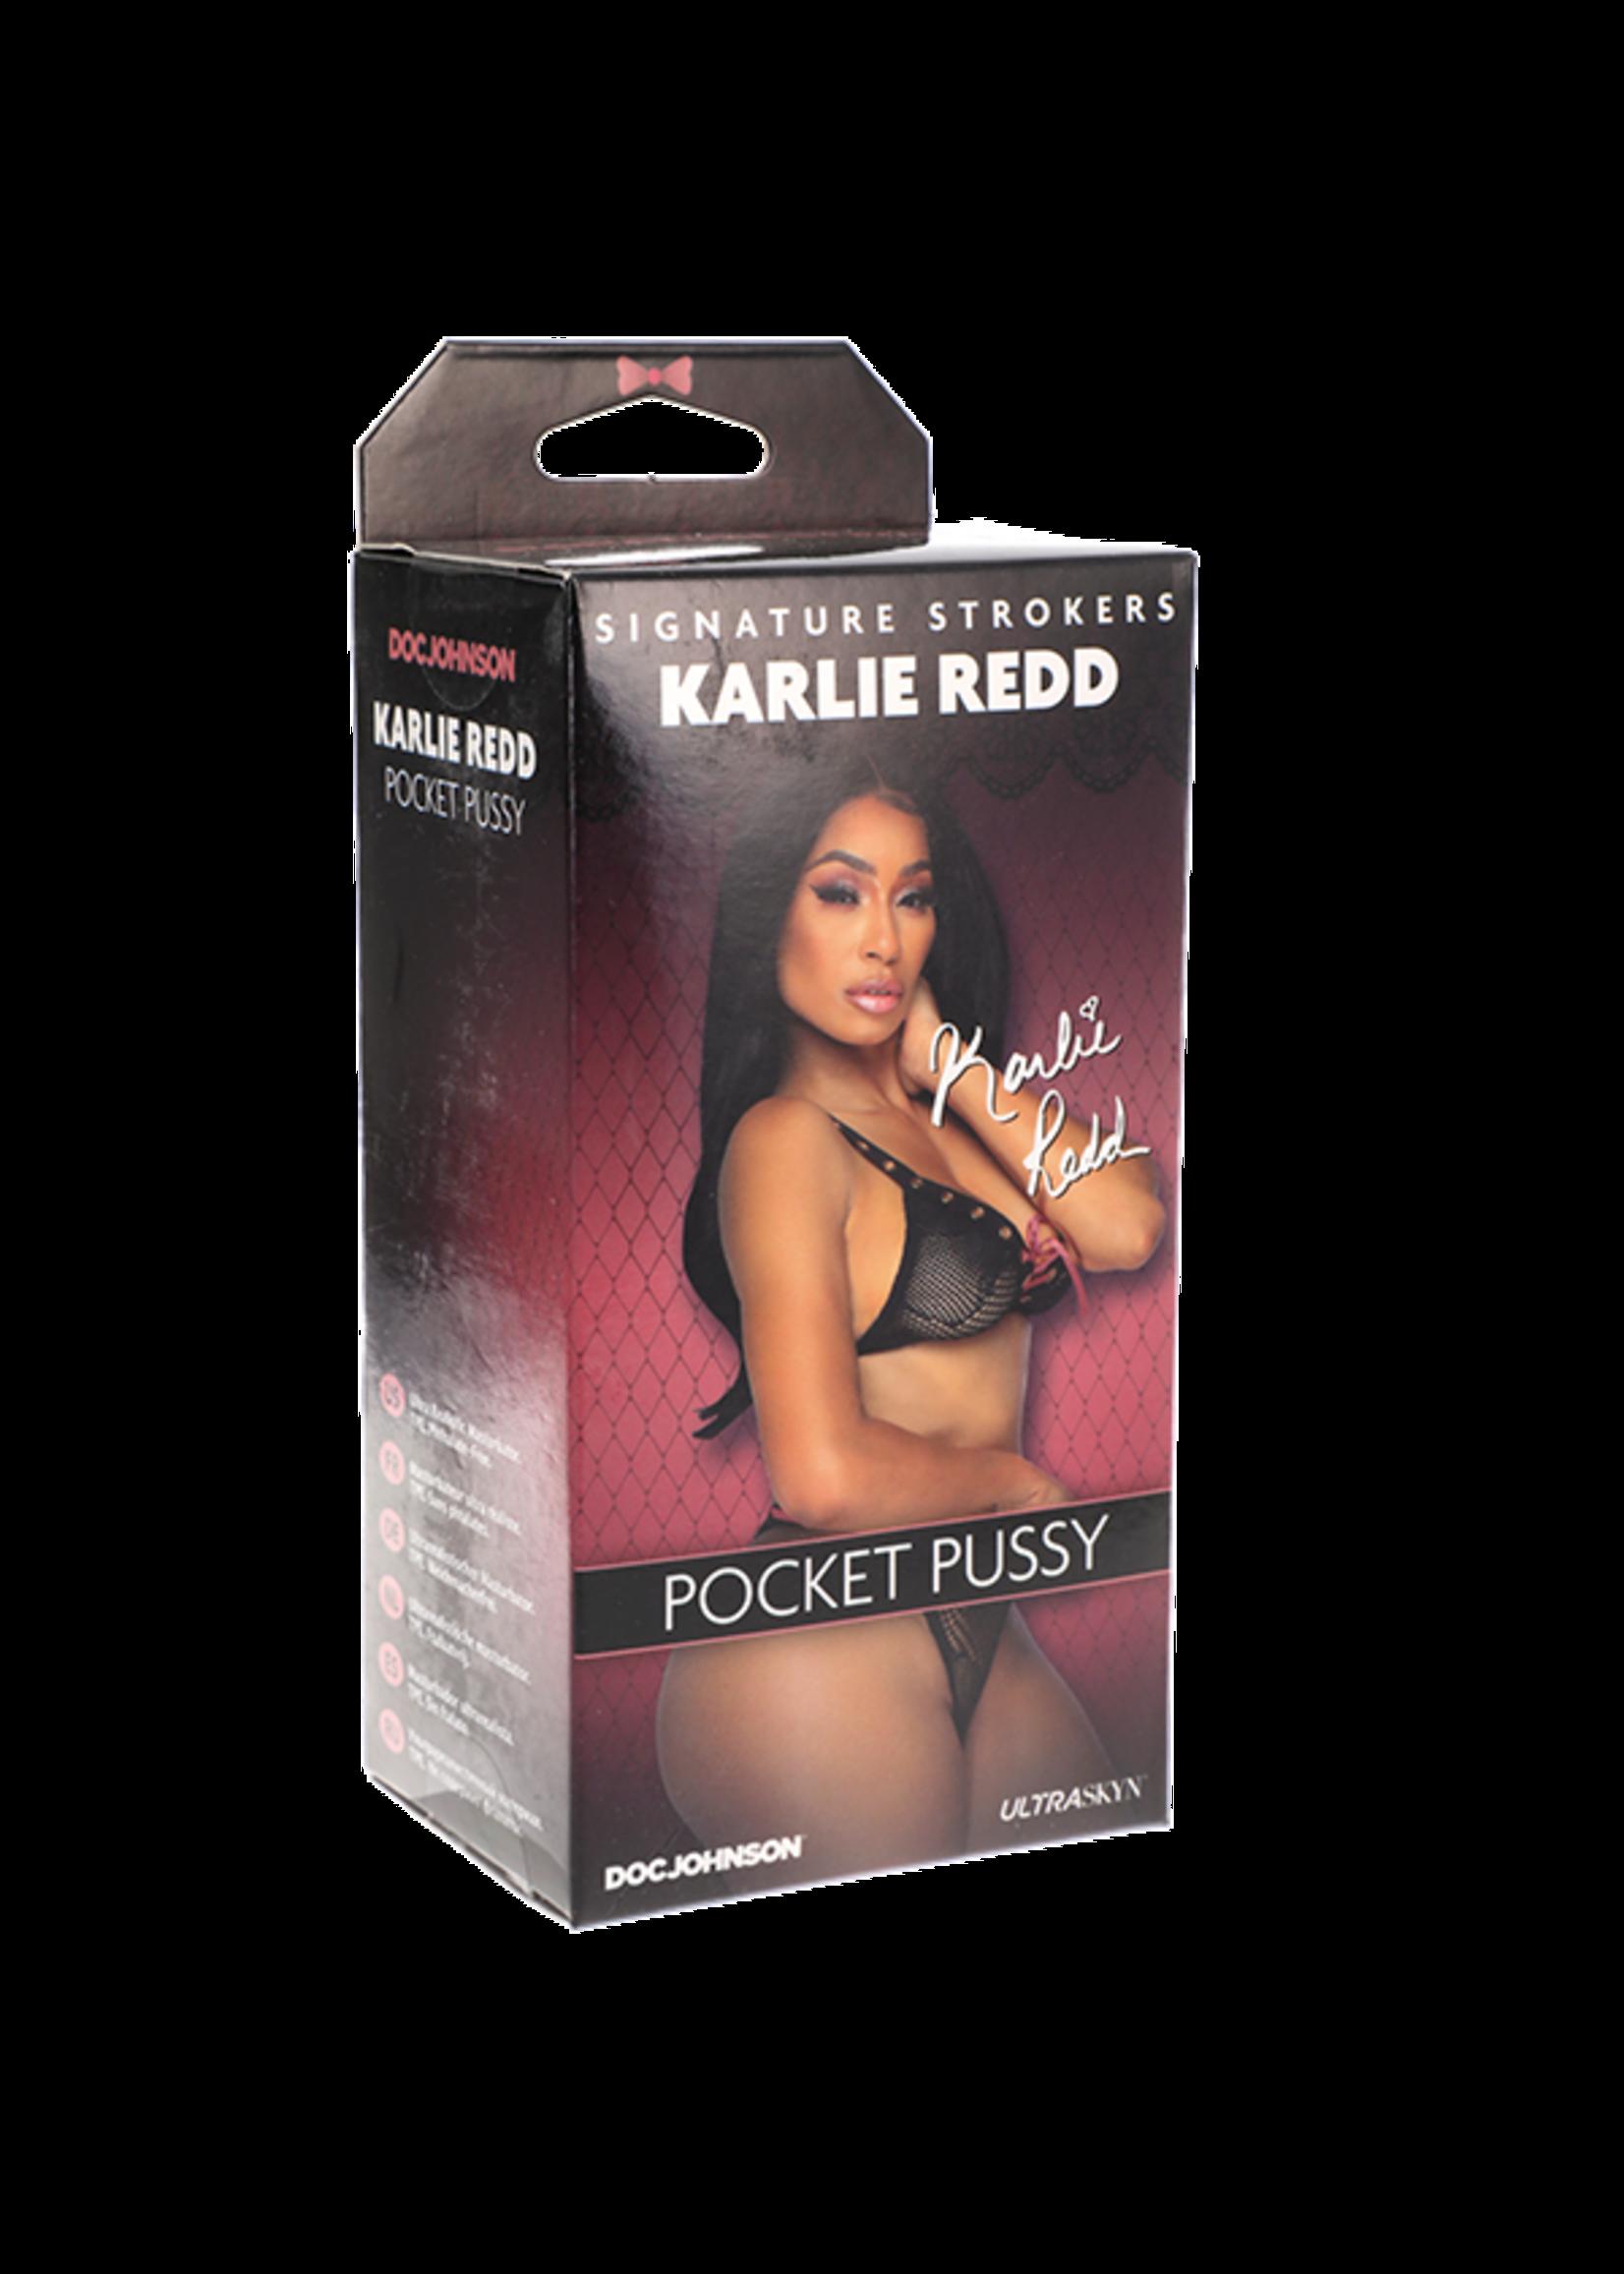 Signature Strokers - Celebrity Girls - Karlie Redd - Pocket Pussy